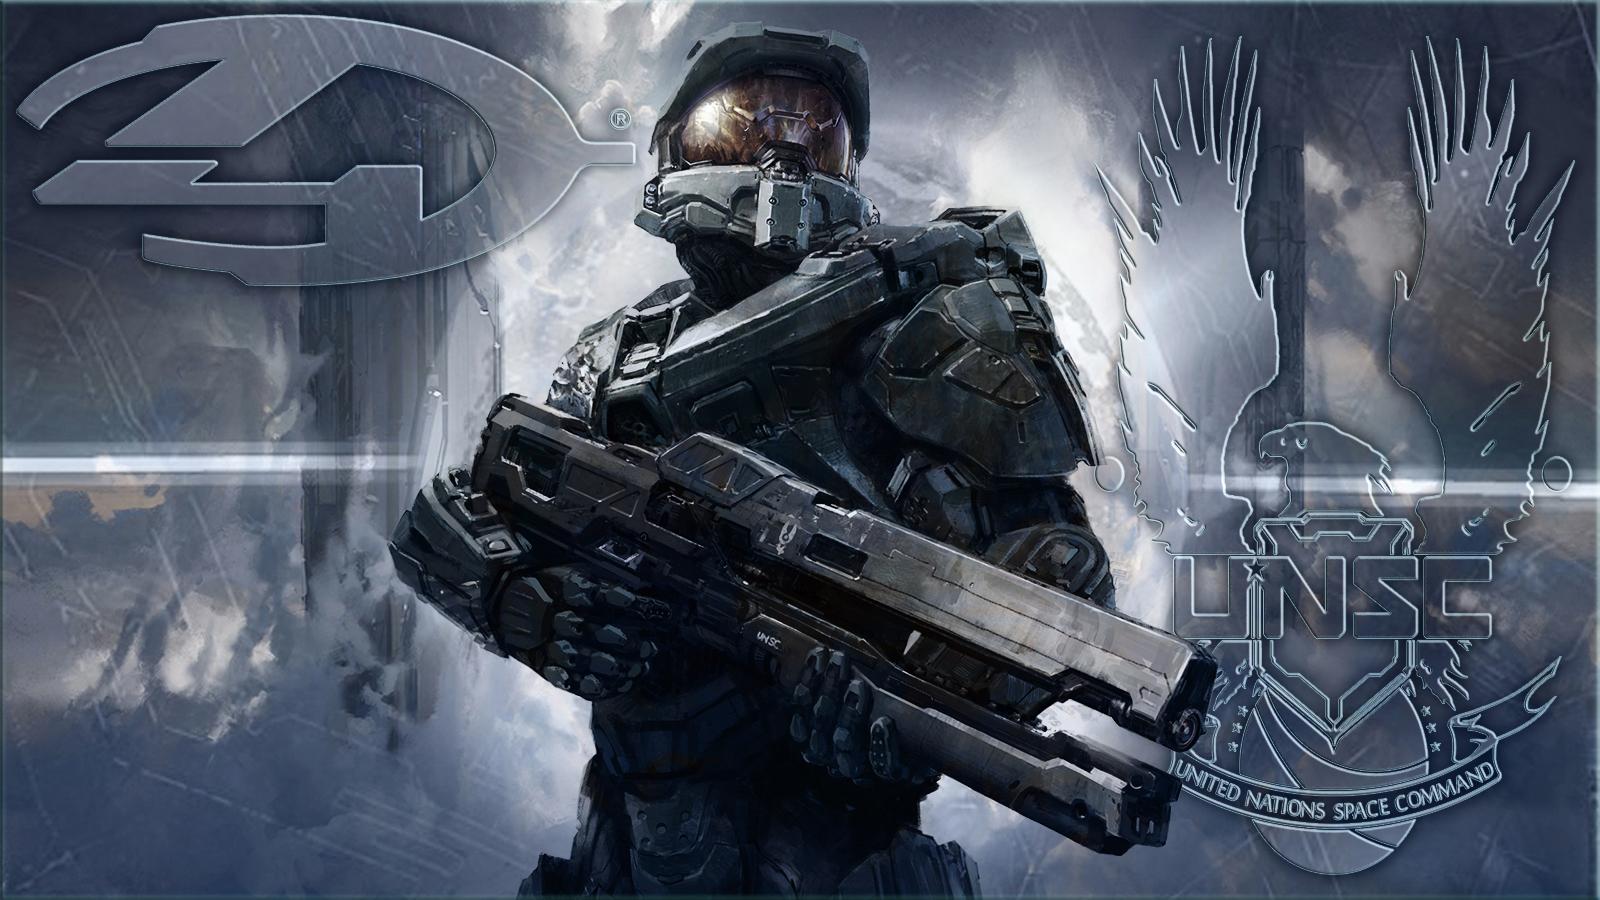 Halo 4 Wallpaper 1080p Halo 4 1600x900